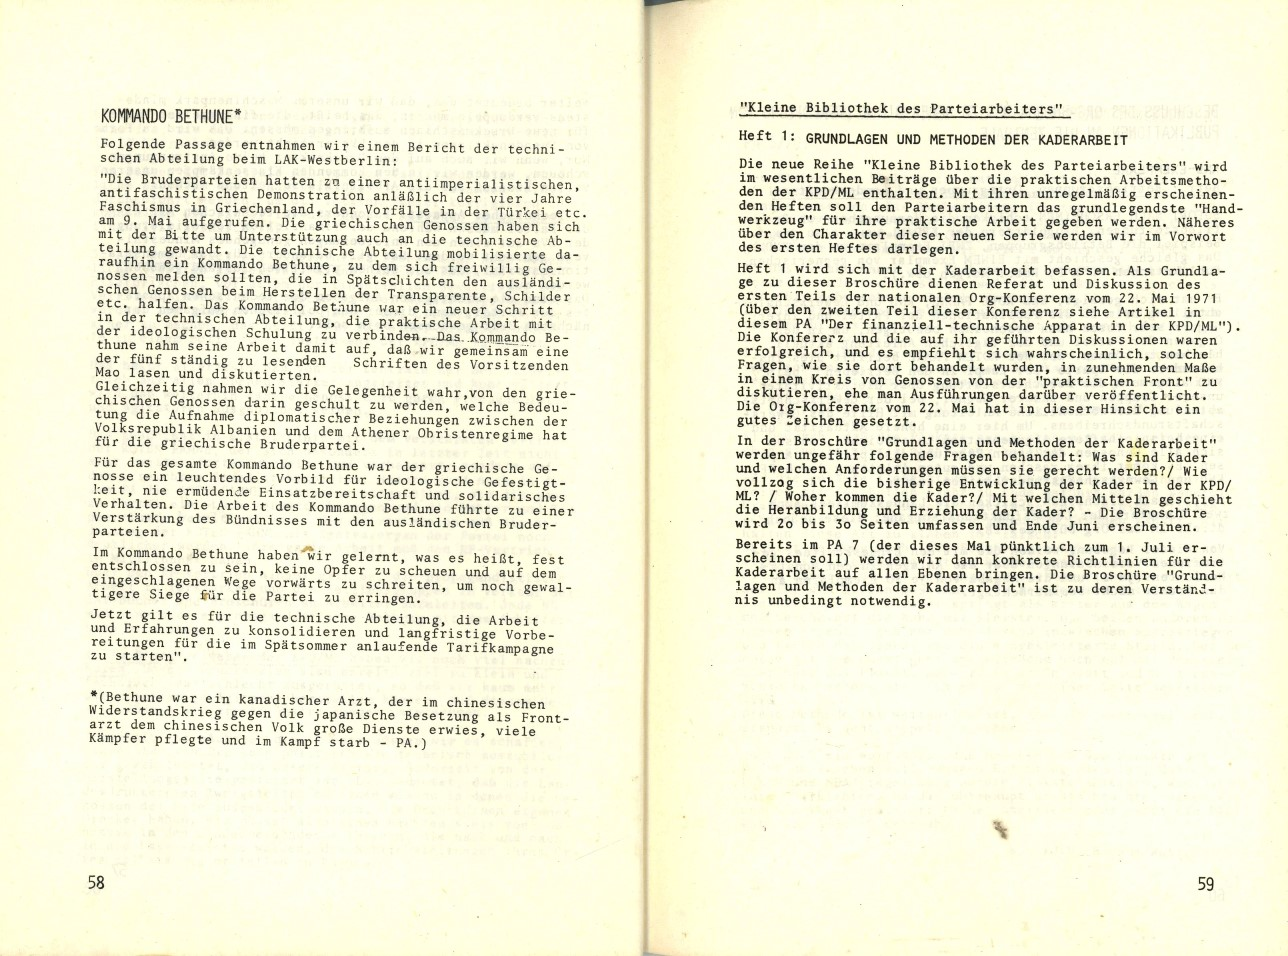 ZB_Parteiarbeiter_1971_06_31